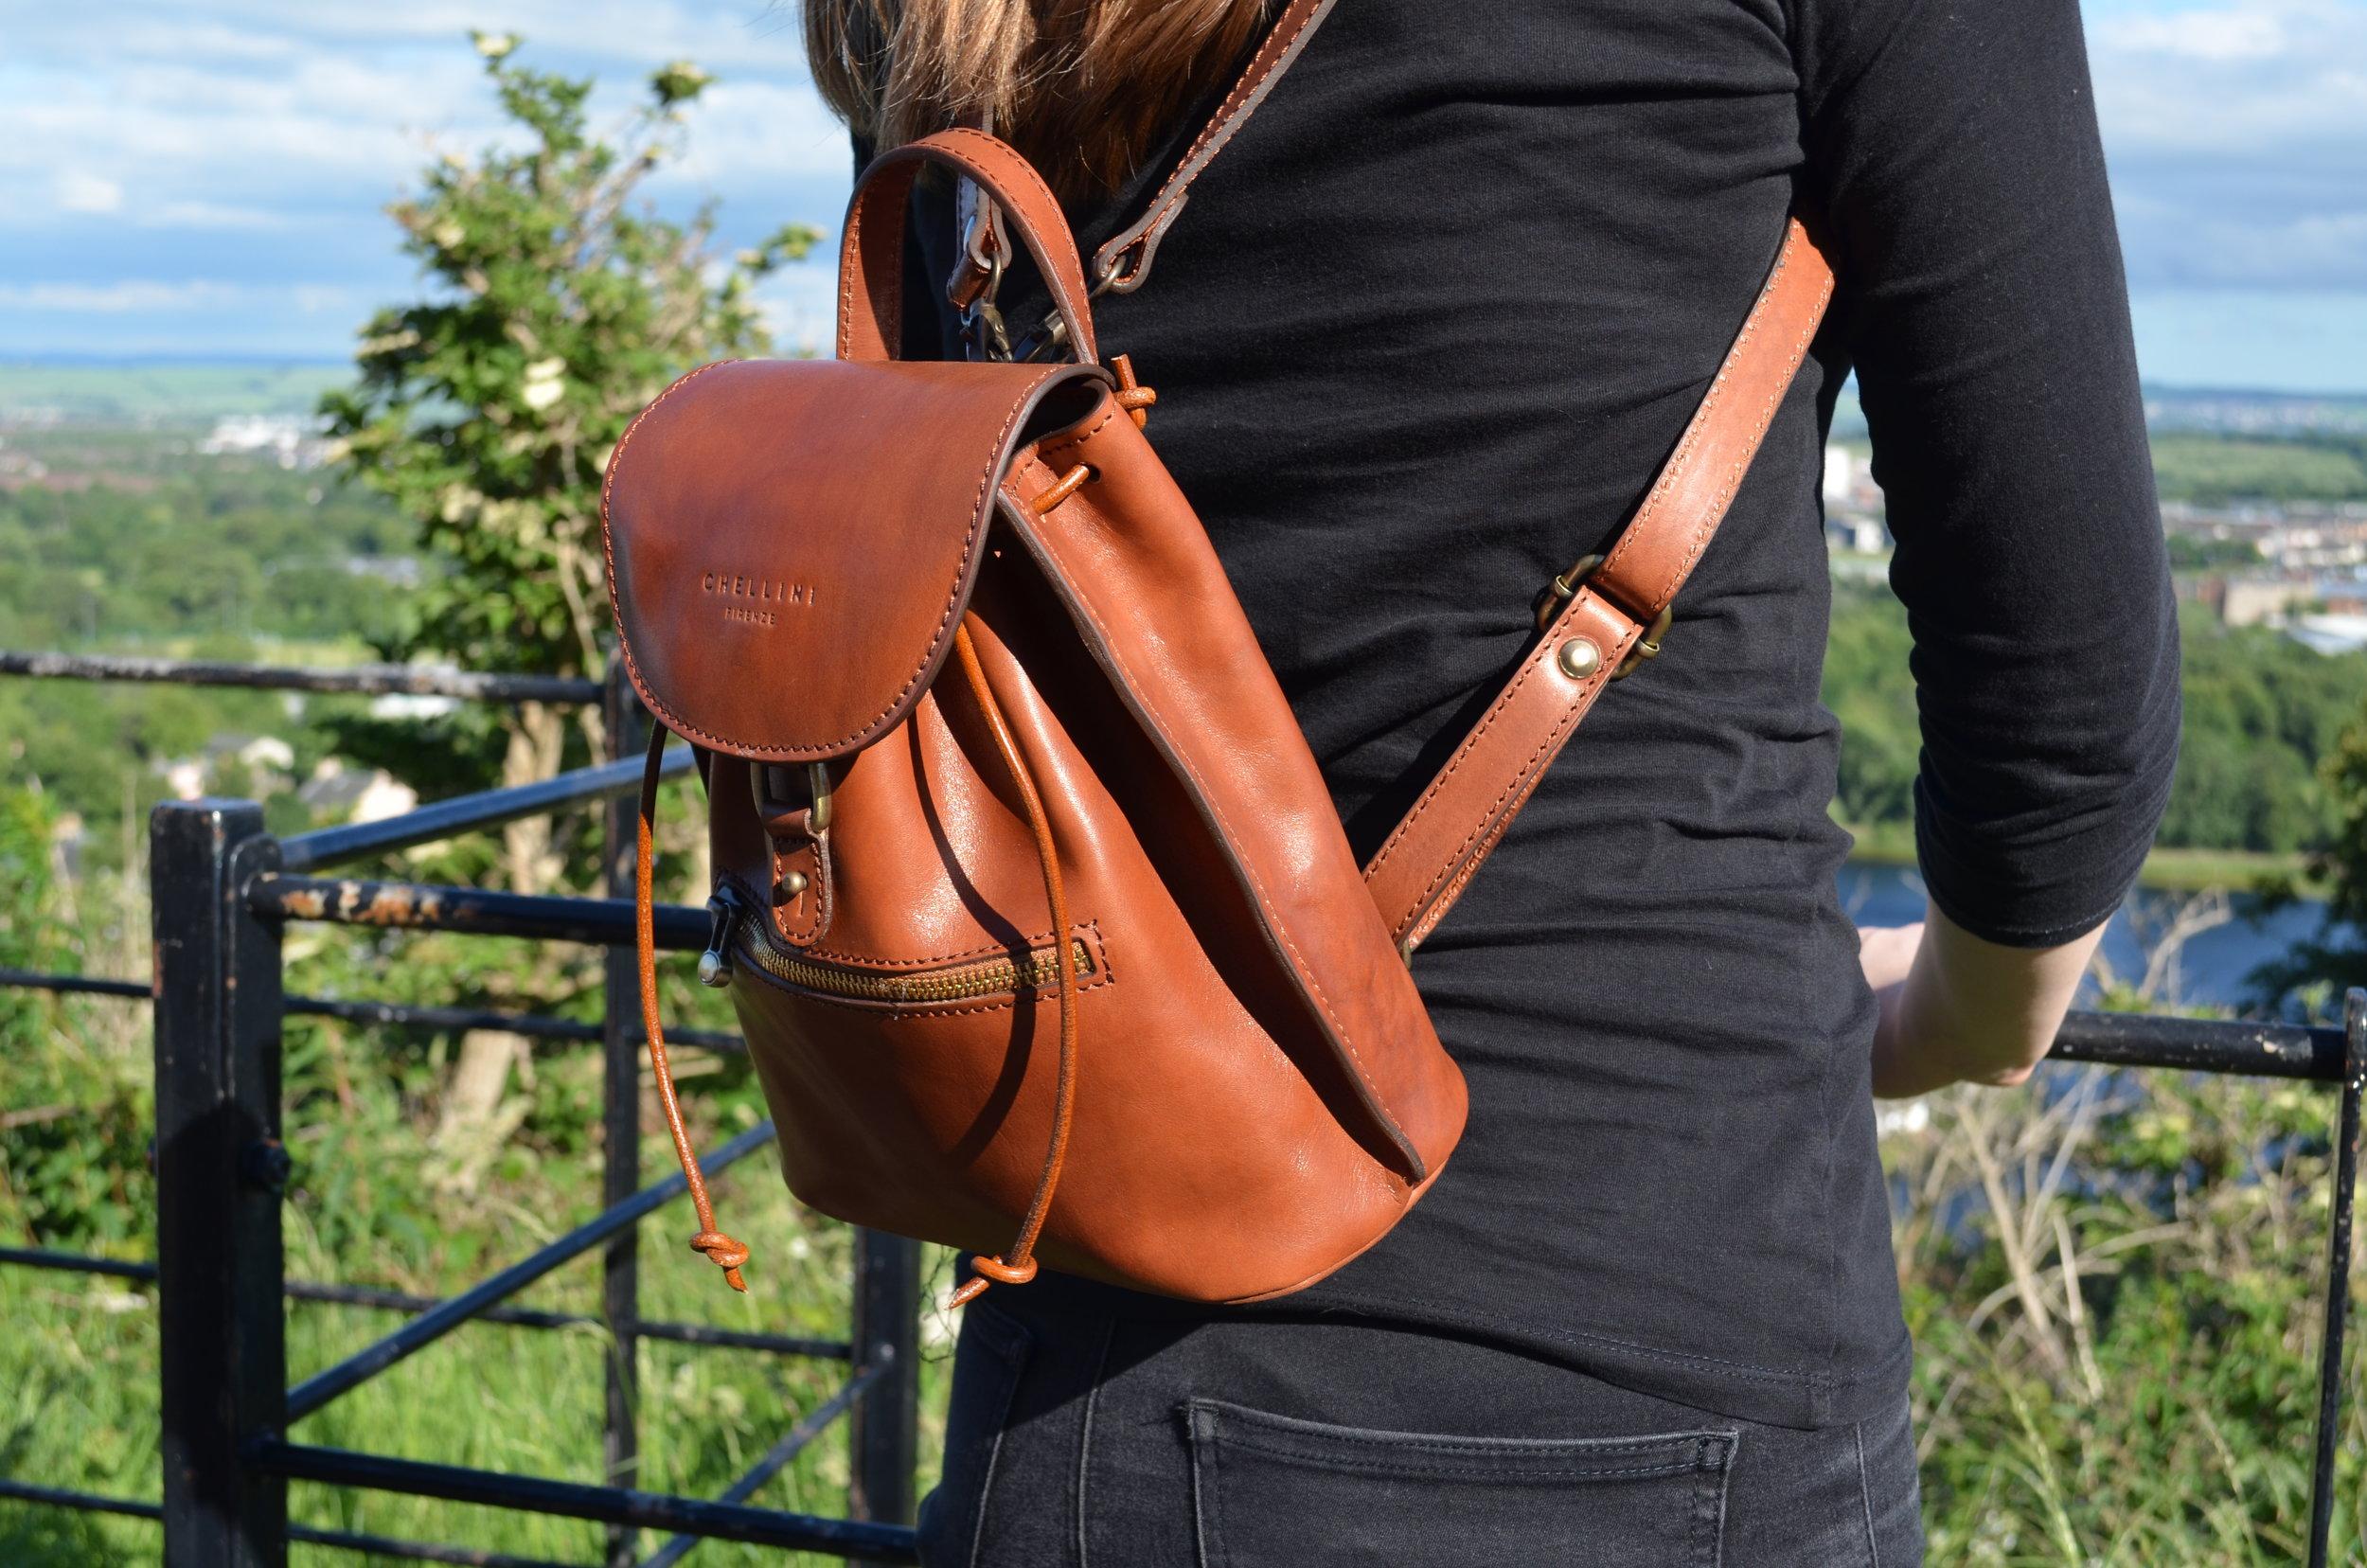 Chellini Firenze Luxury Italian Small Leather Backpack